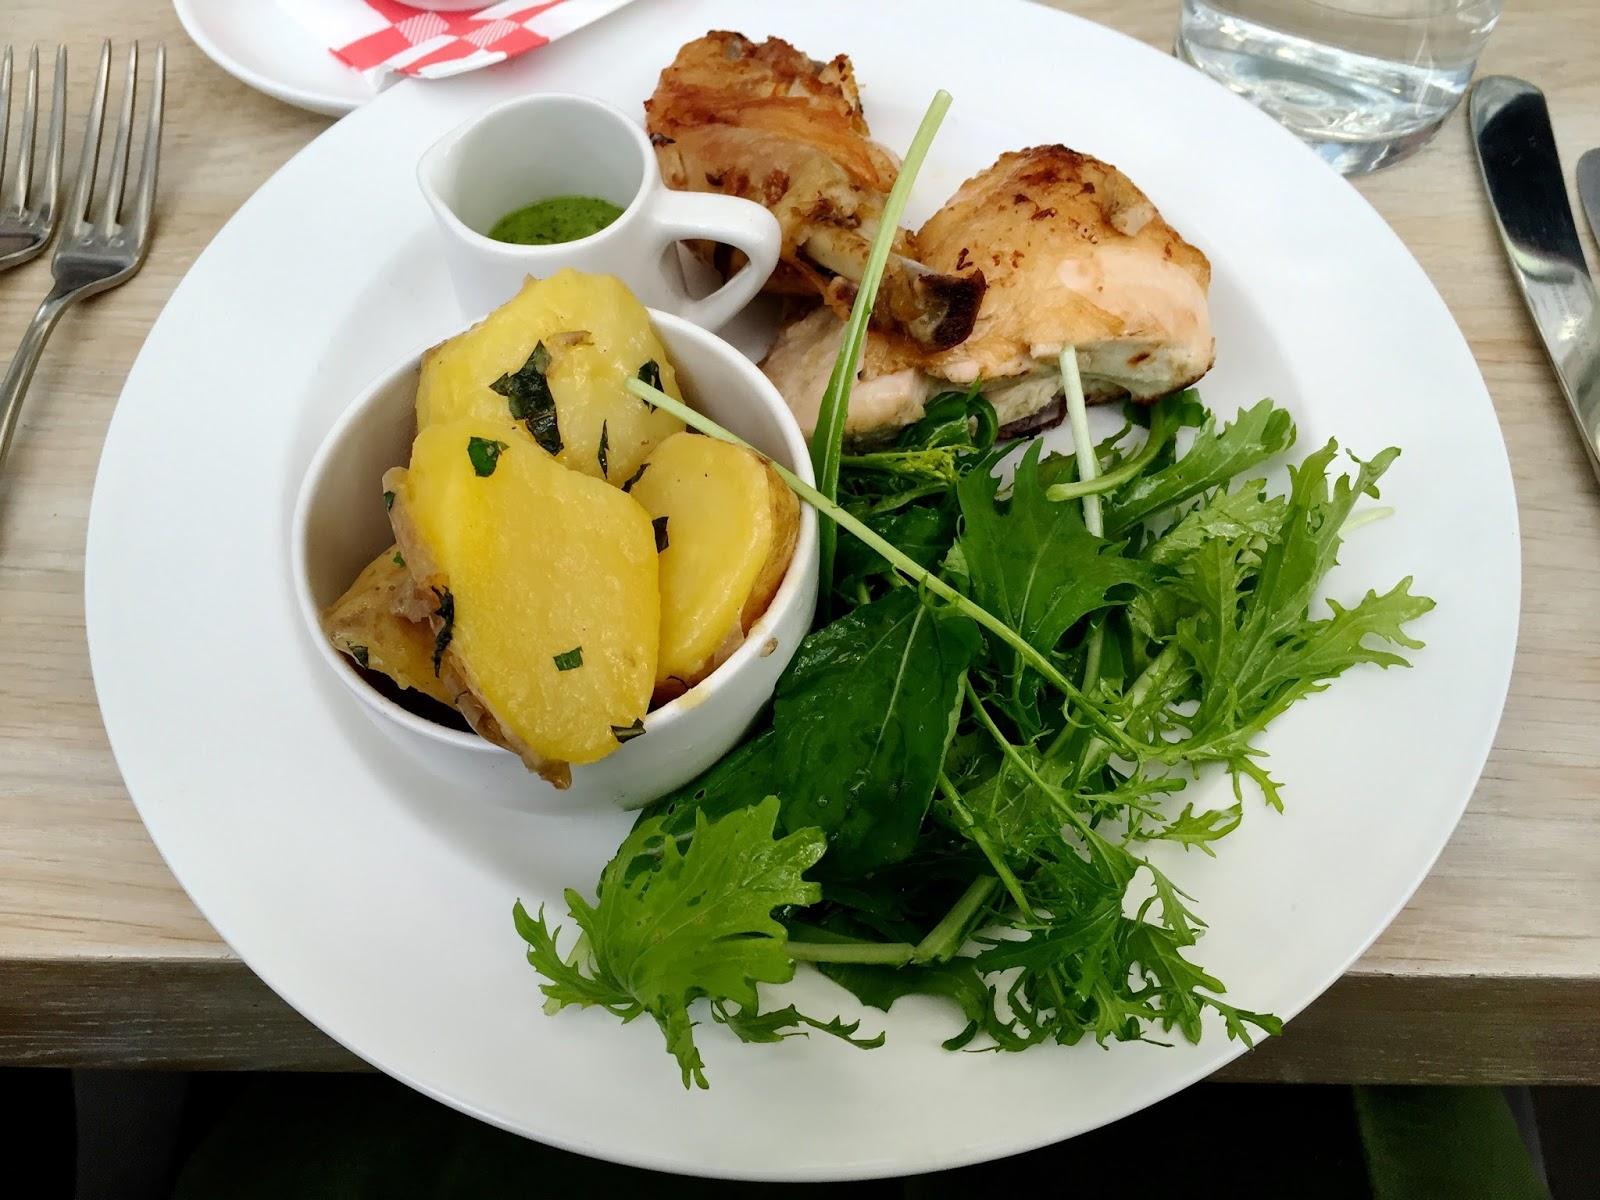 roast chicken, potatoes and salad